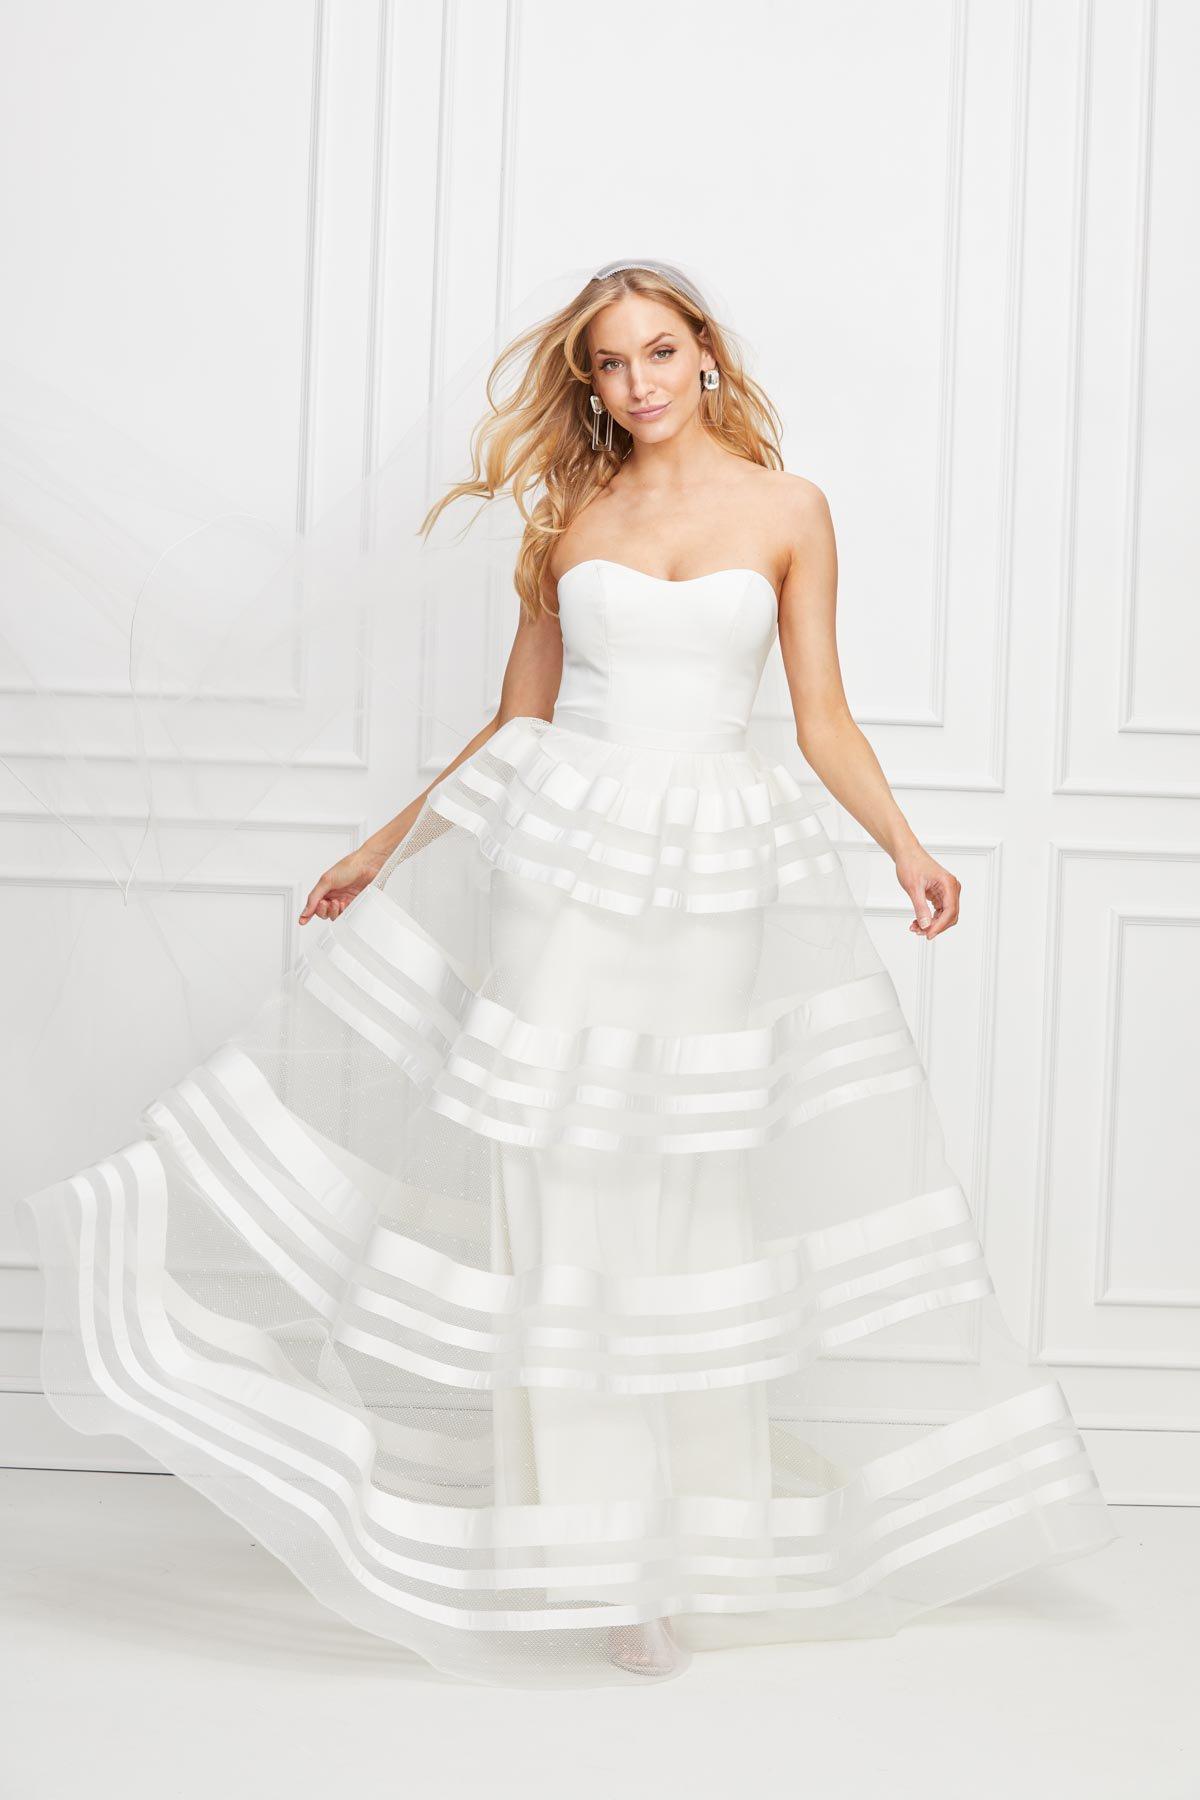 Gemmy Skirt - Featured photo